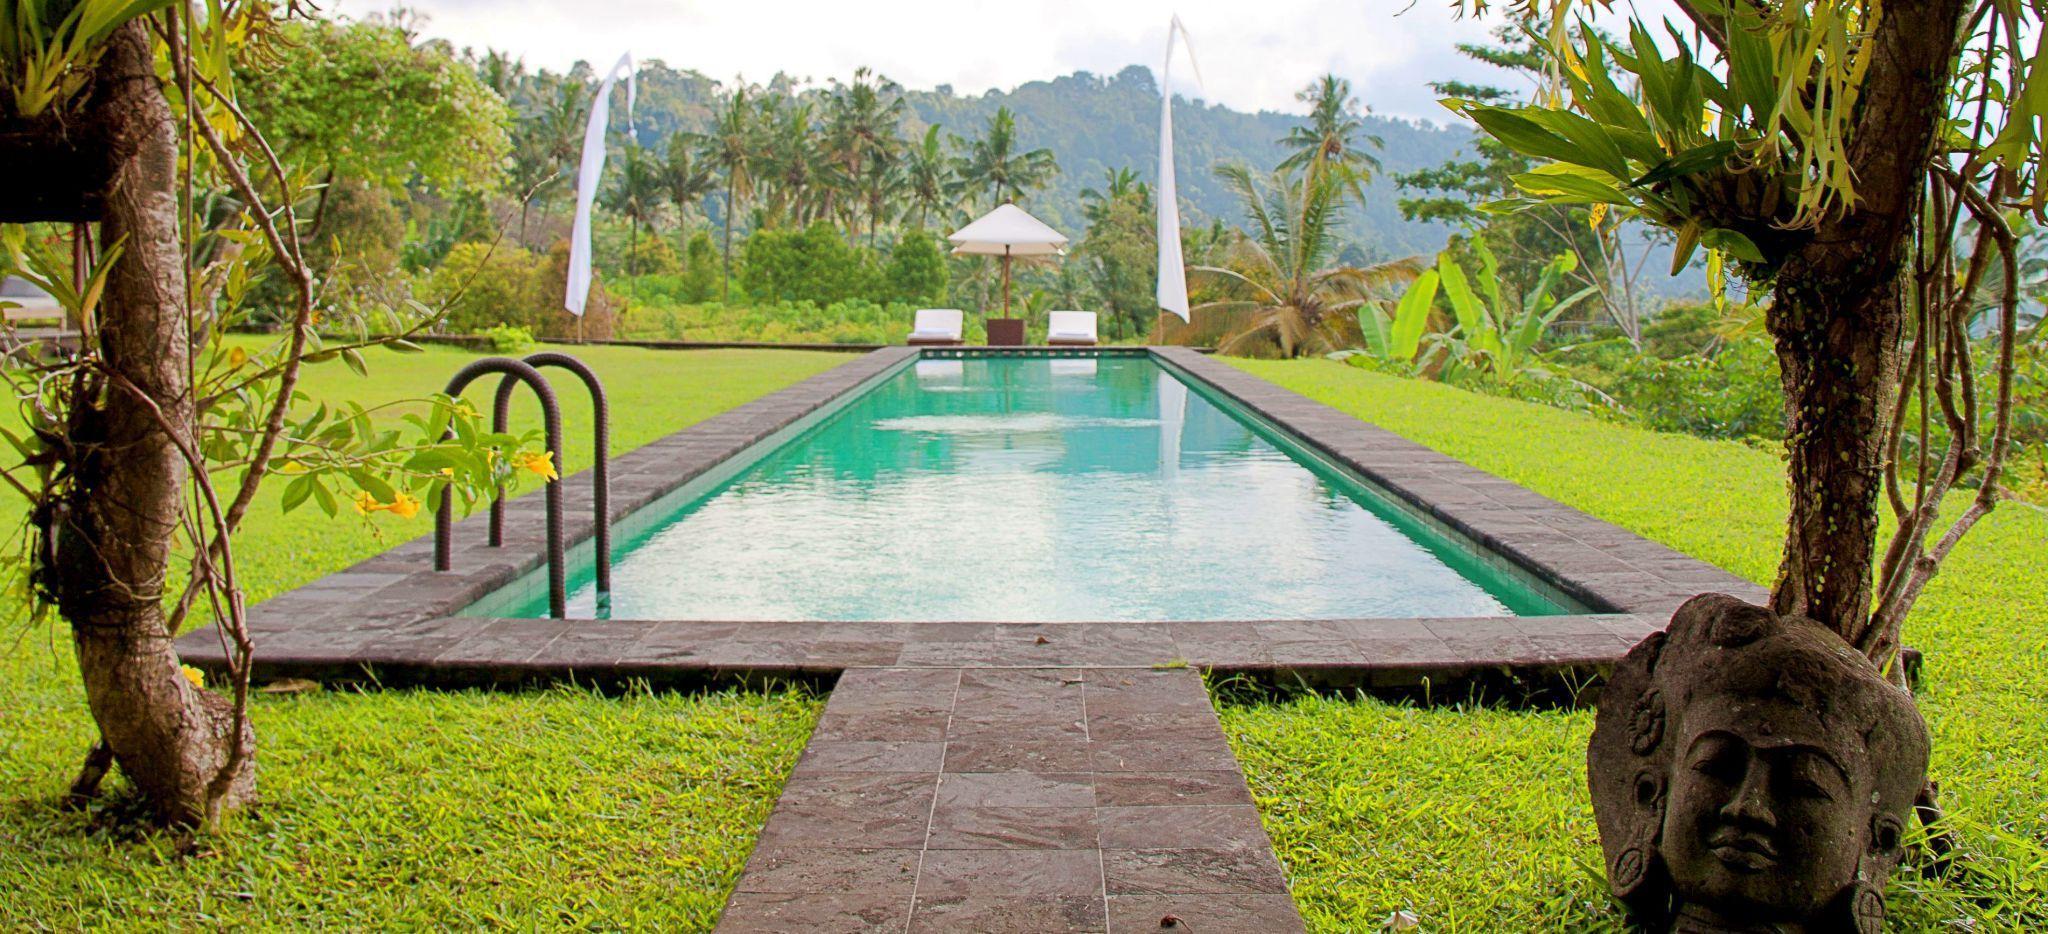 Pool im grünen, im Hotel Alila Manggis, Bali